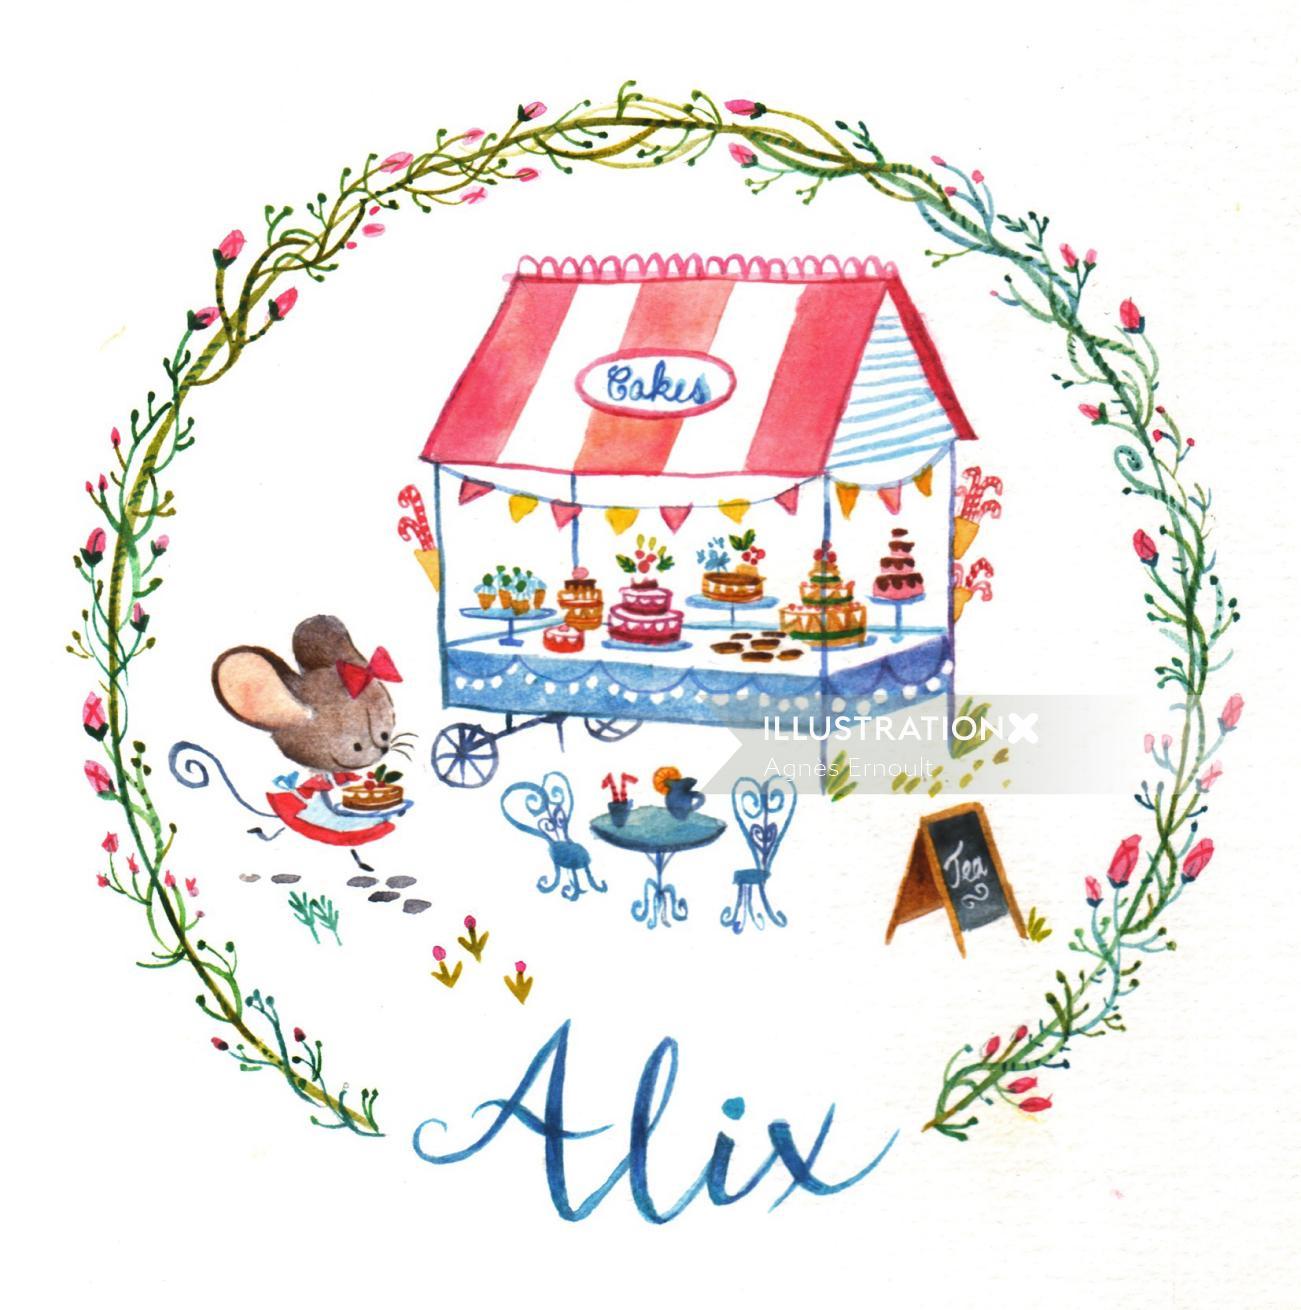 Colour pencil drawing of alix ice cream